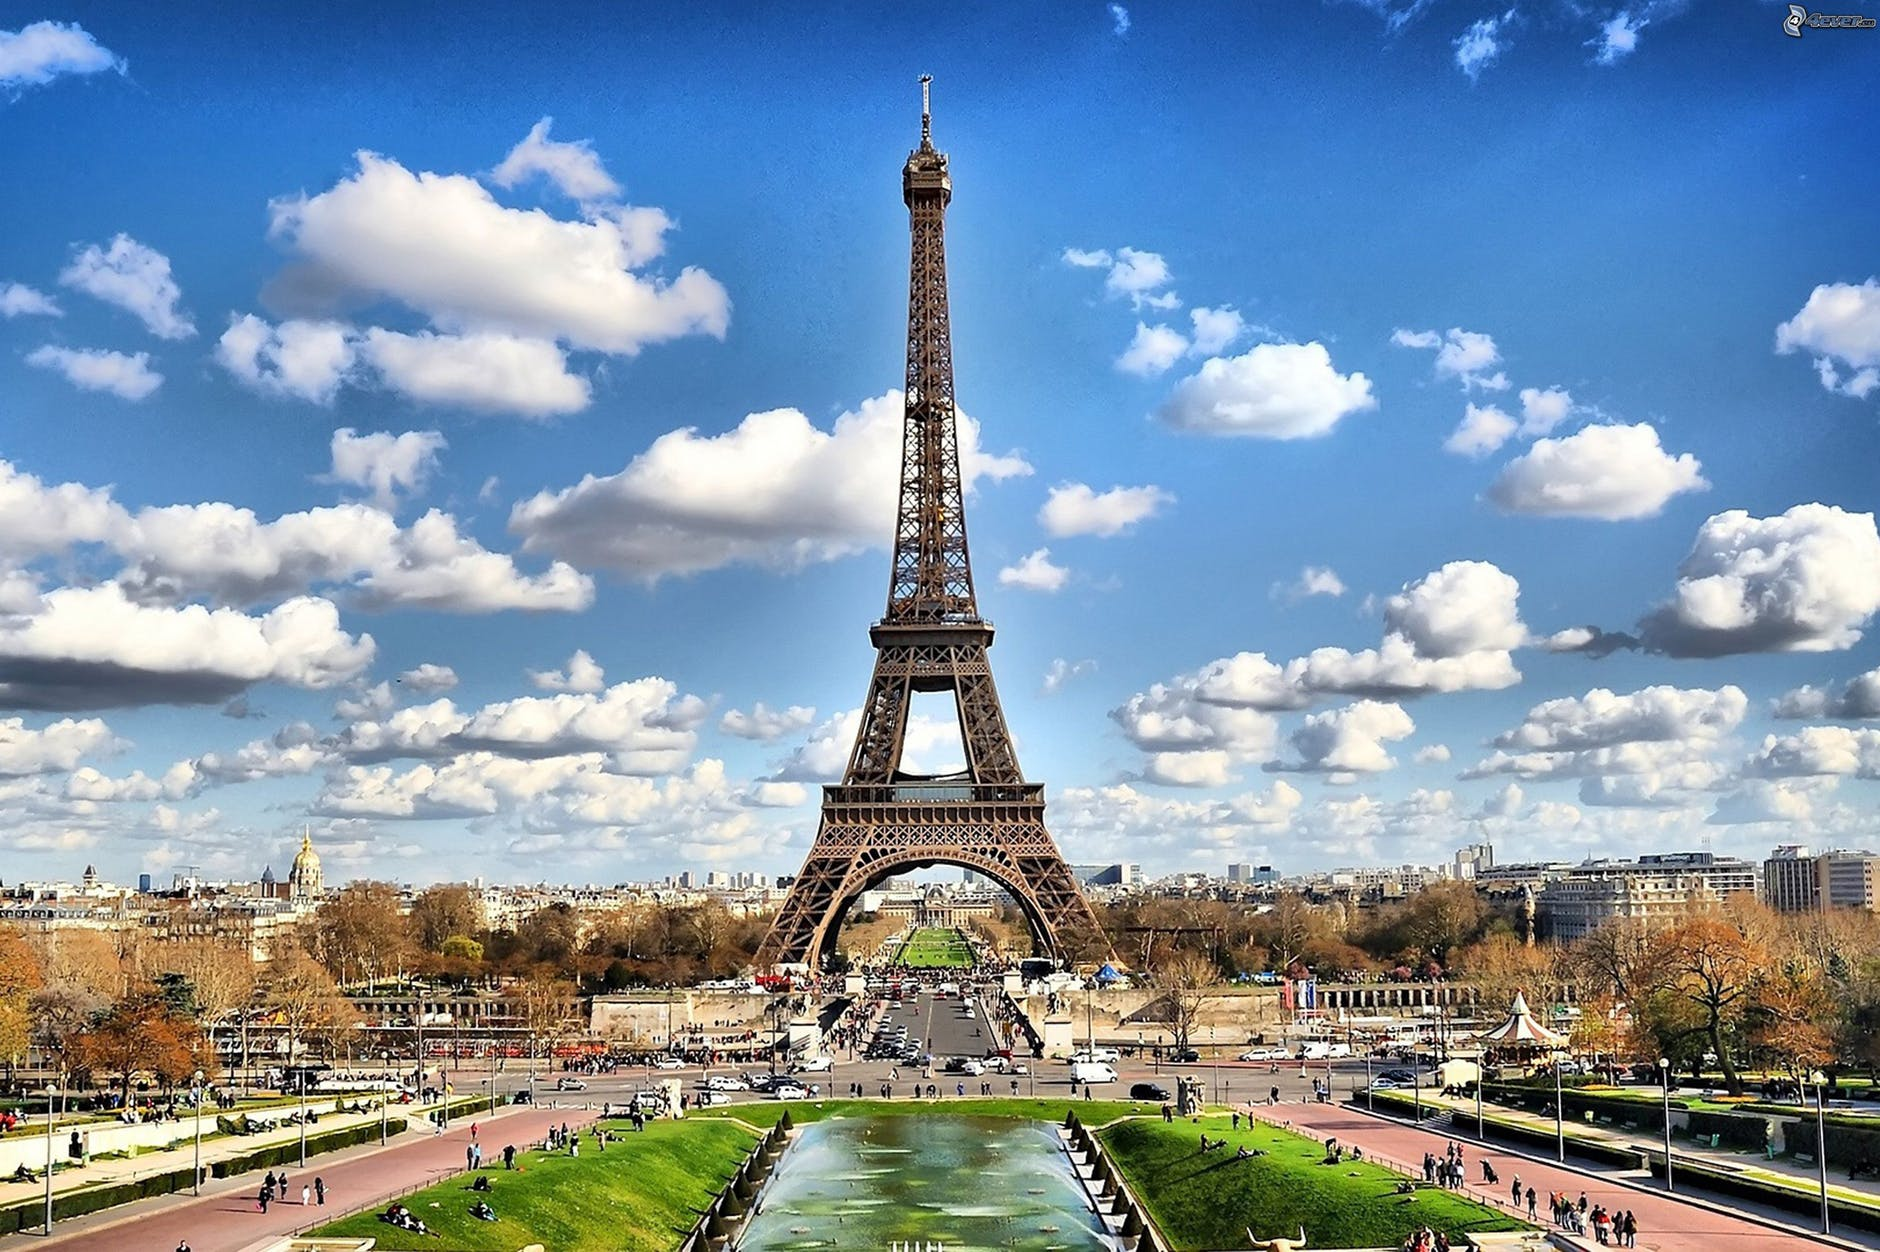 Eiffel Tower, Paris - World Site Guides